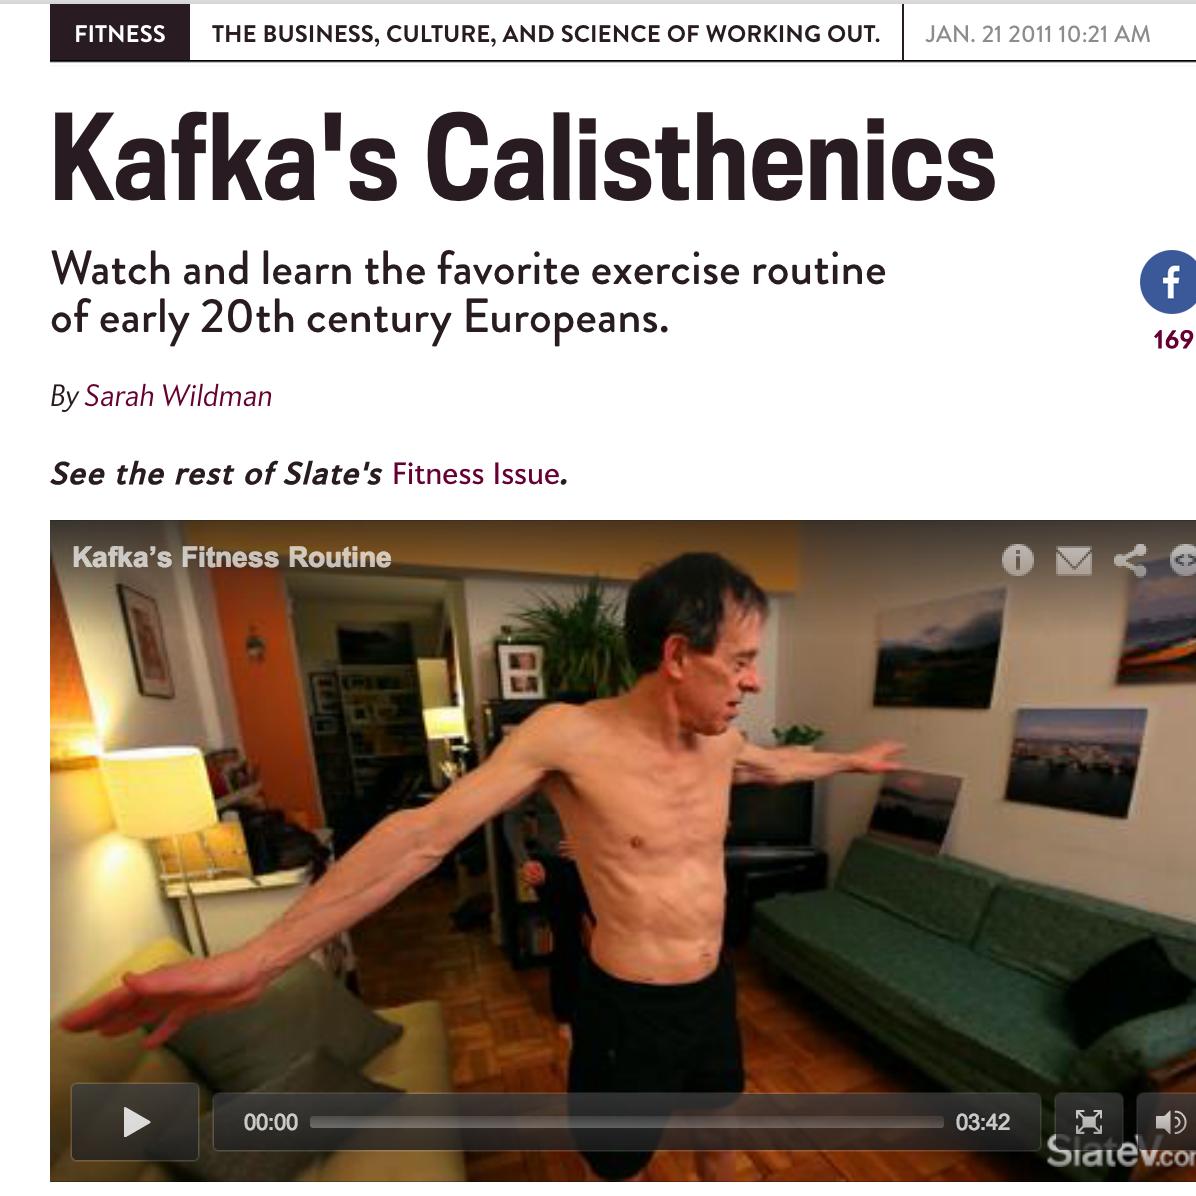 Kafka's Calisthenics